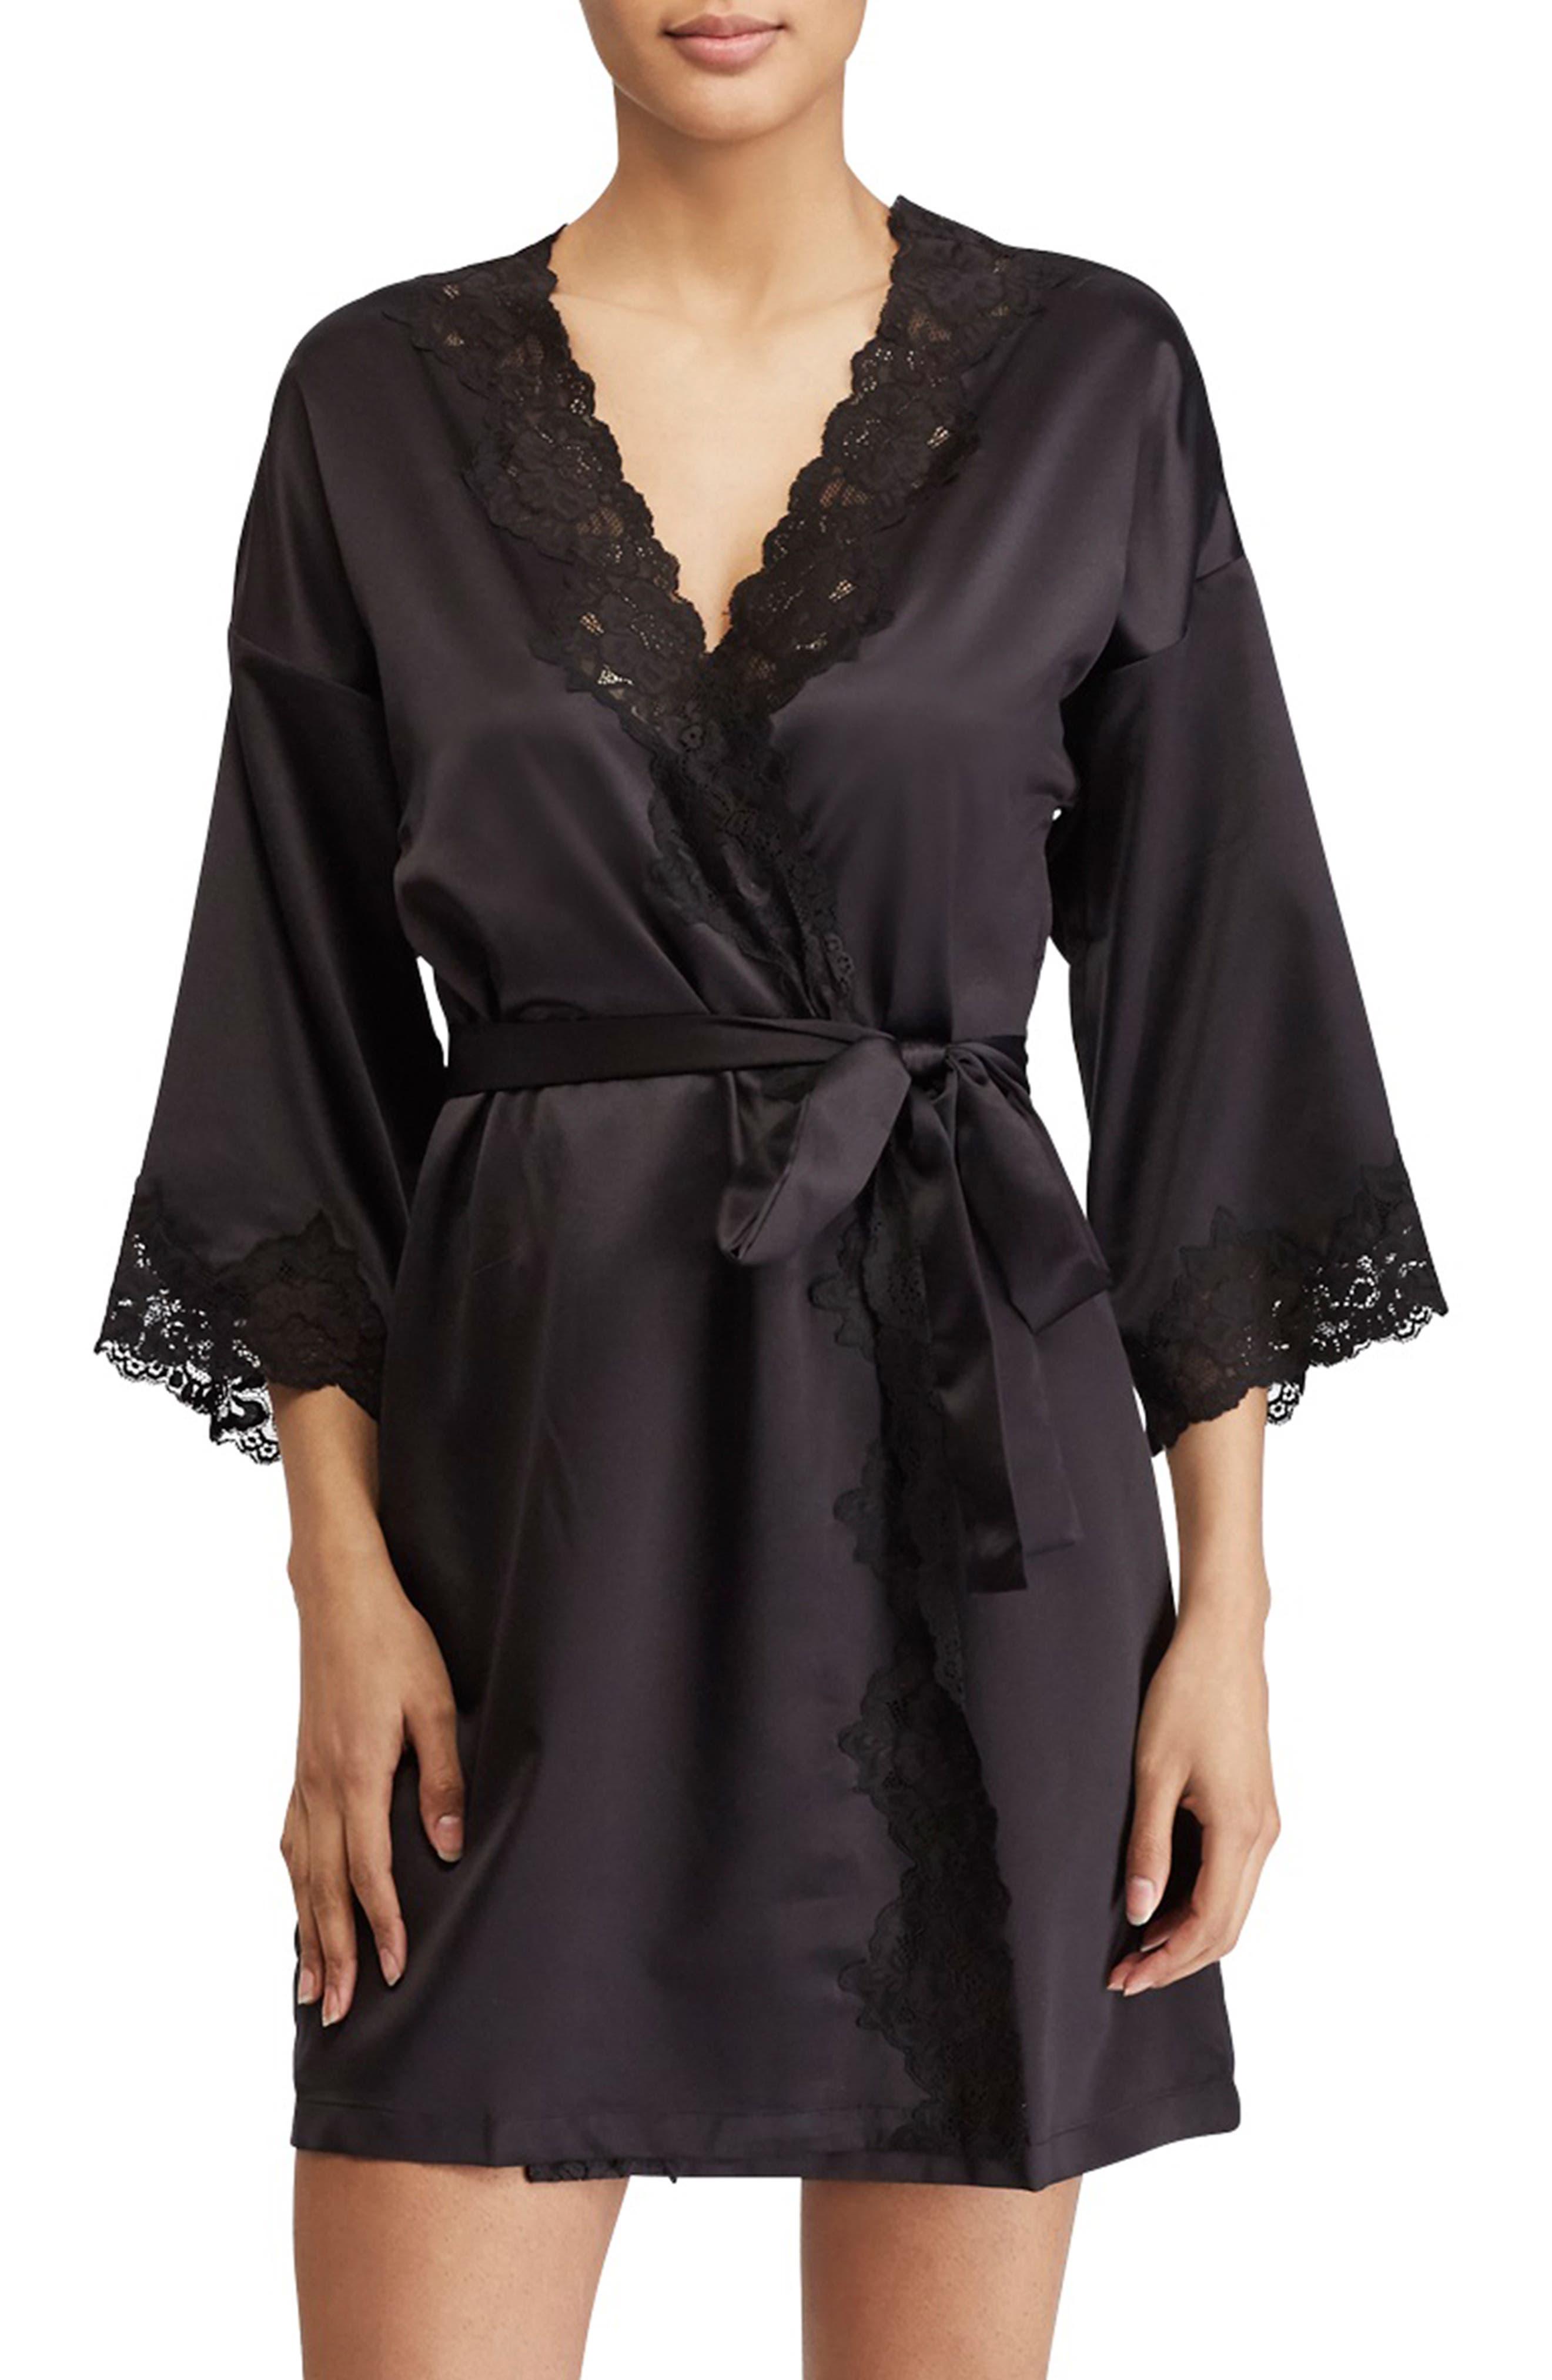 LAUREN RALPH LAUREN Lace Trim Houndstooth Satin Robe, Main, color, BLACK